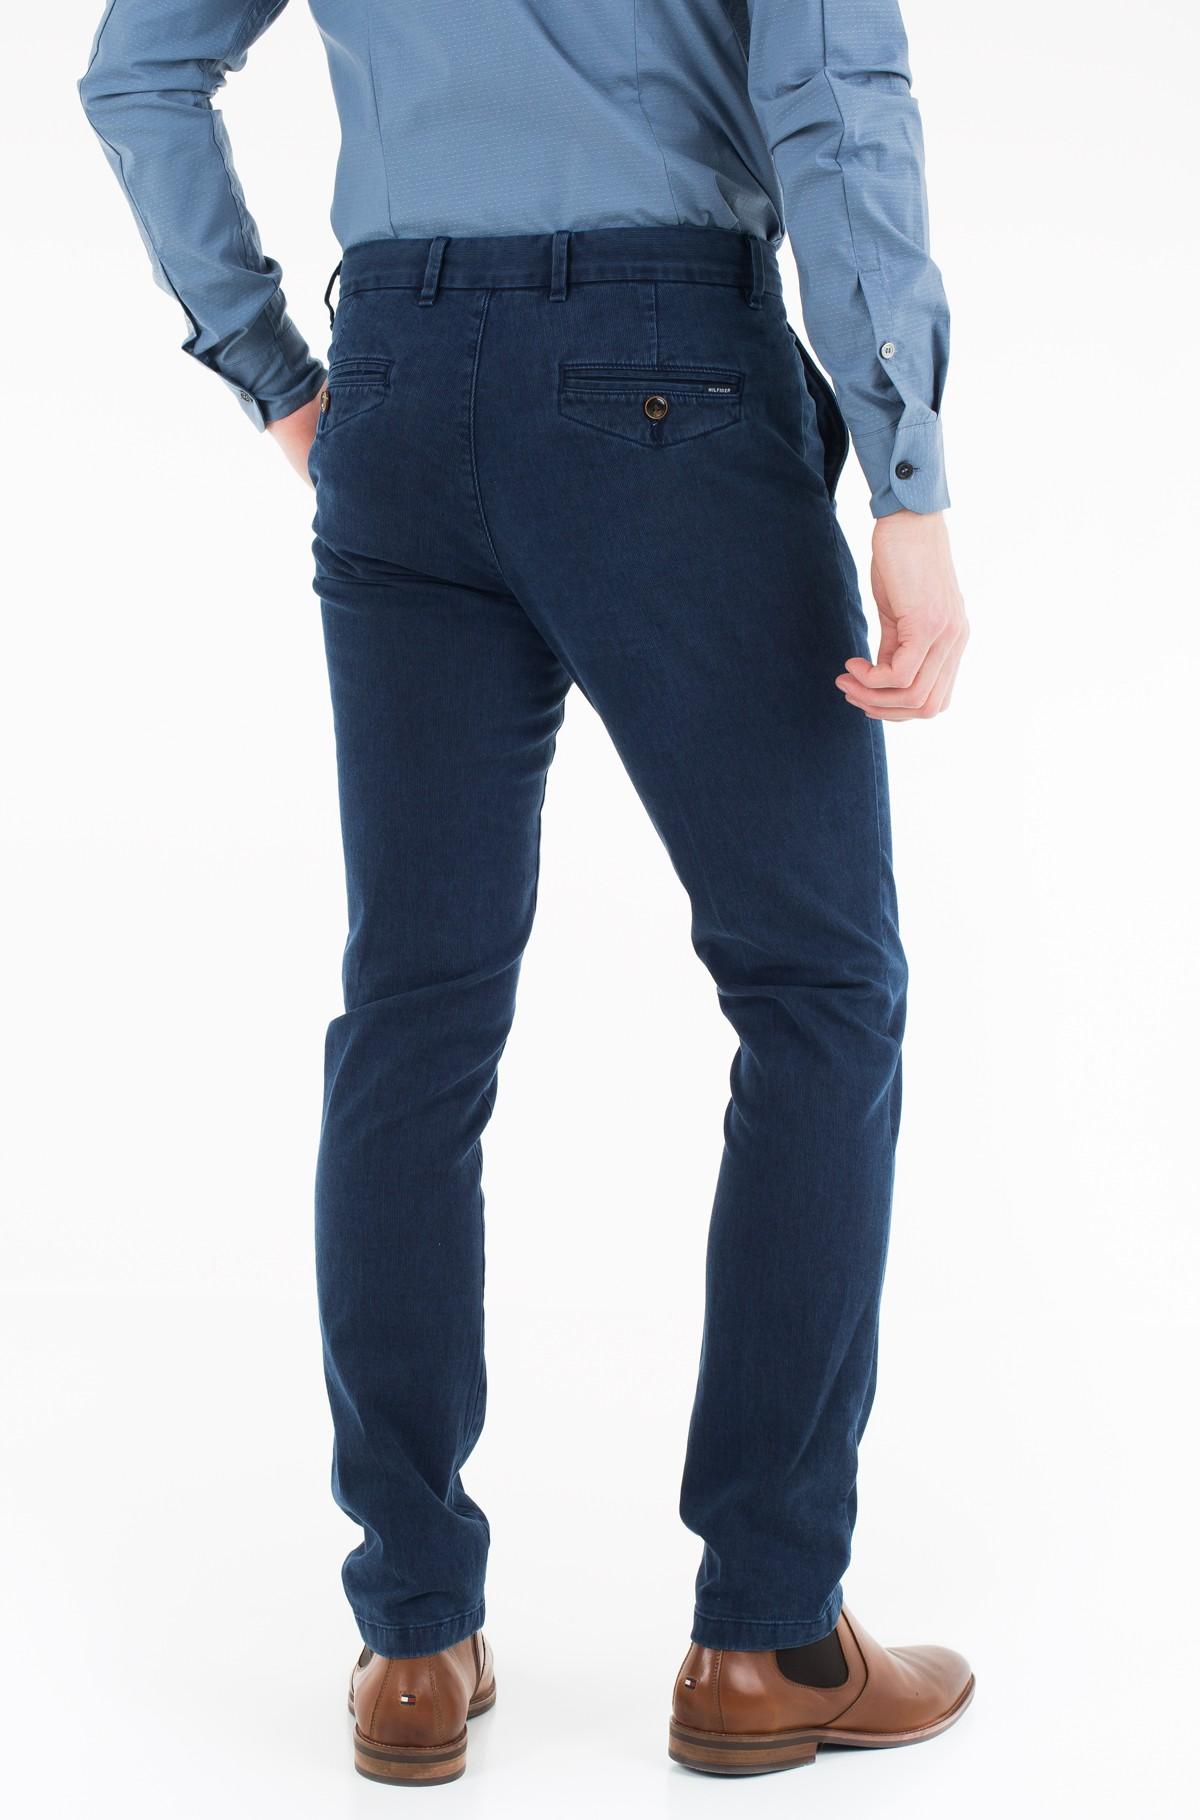 Trousers Denton Chino Stripe Sulphur Dye-full-2